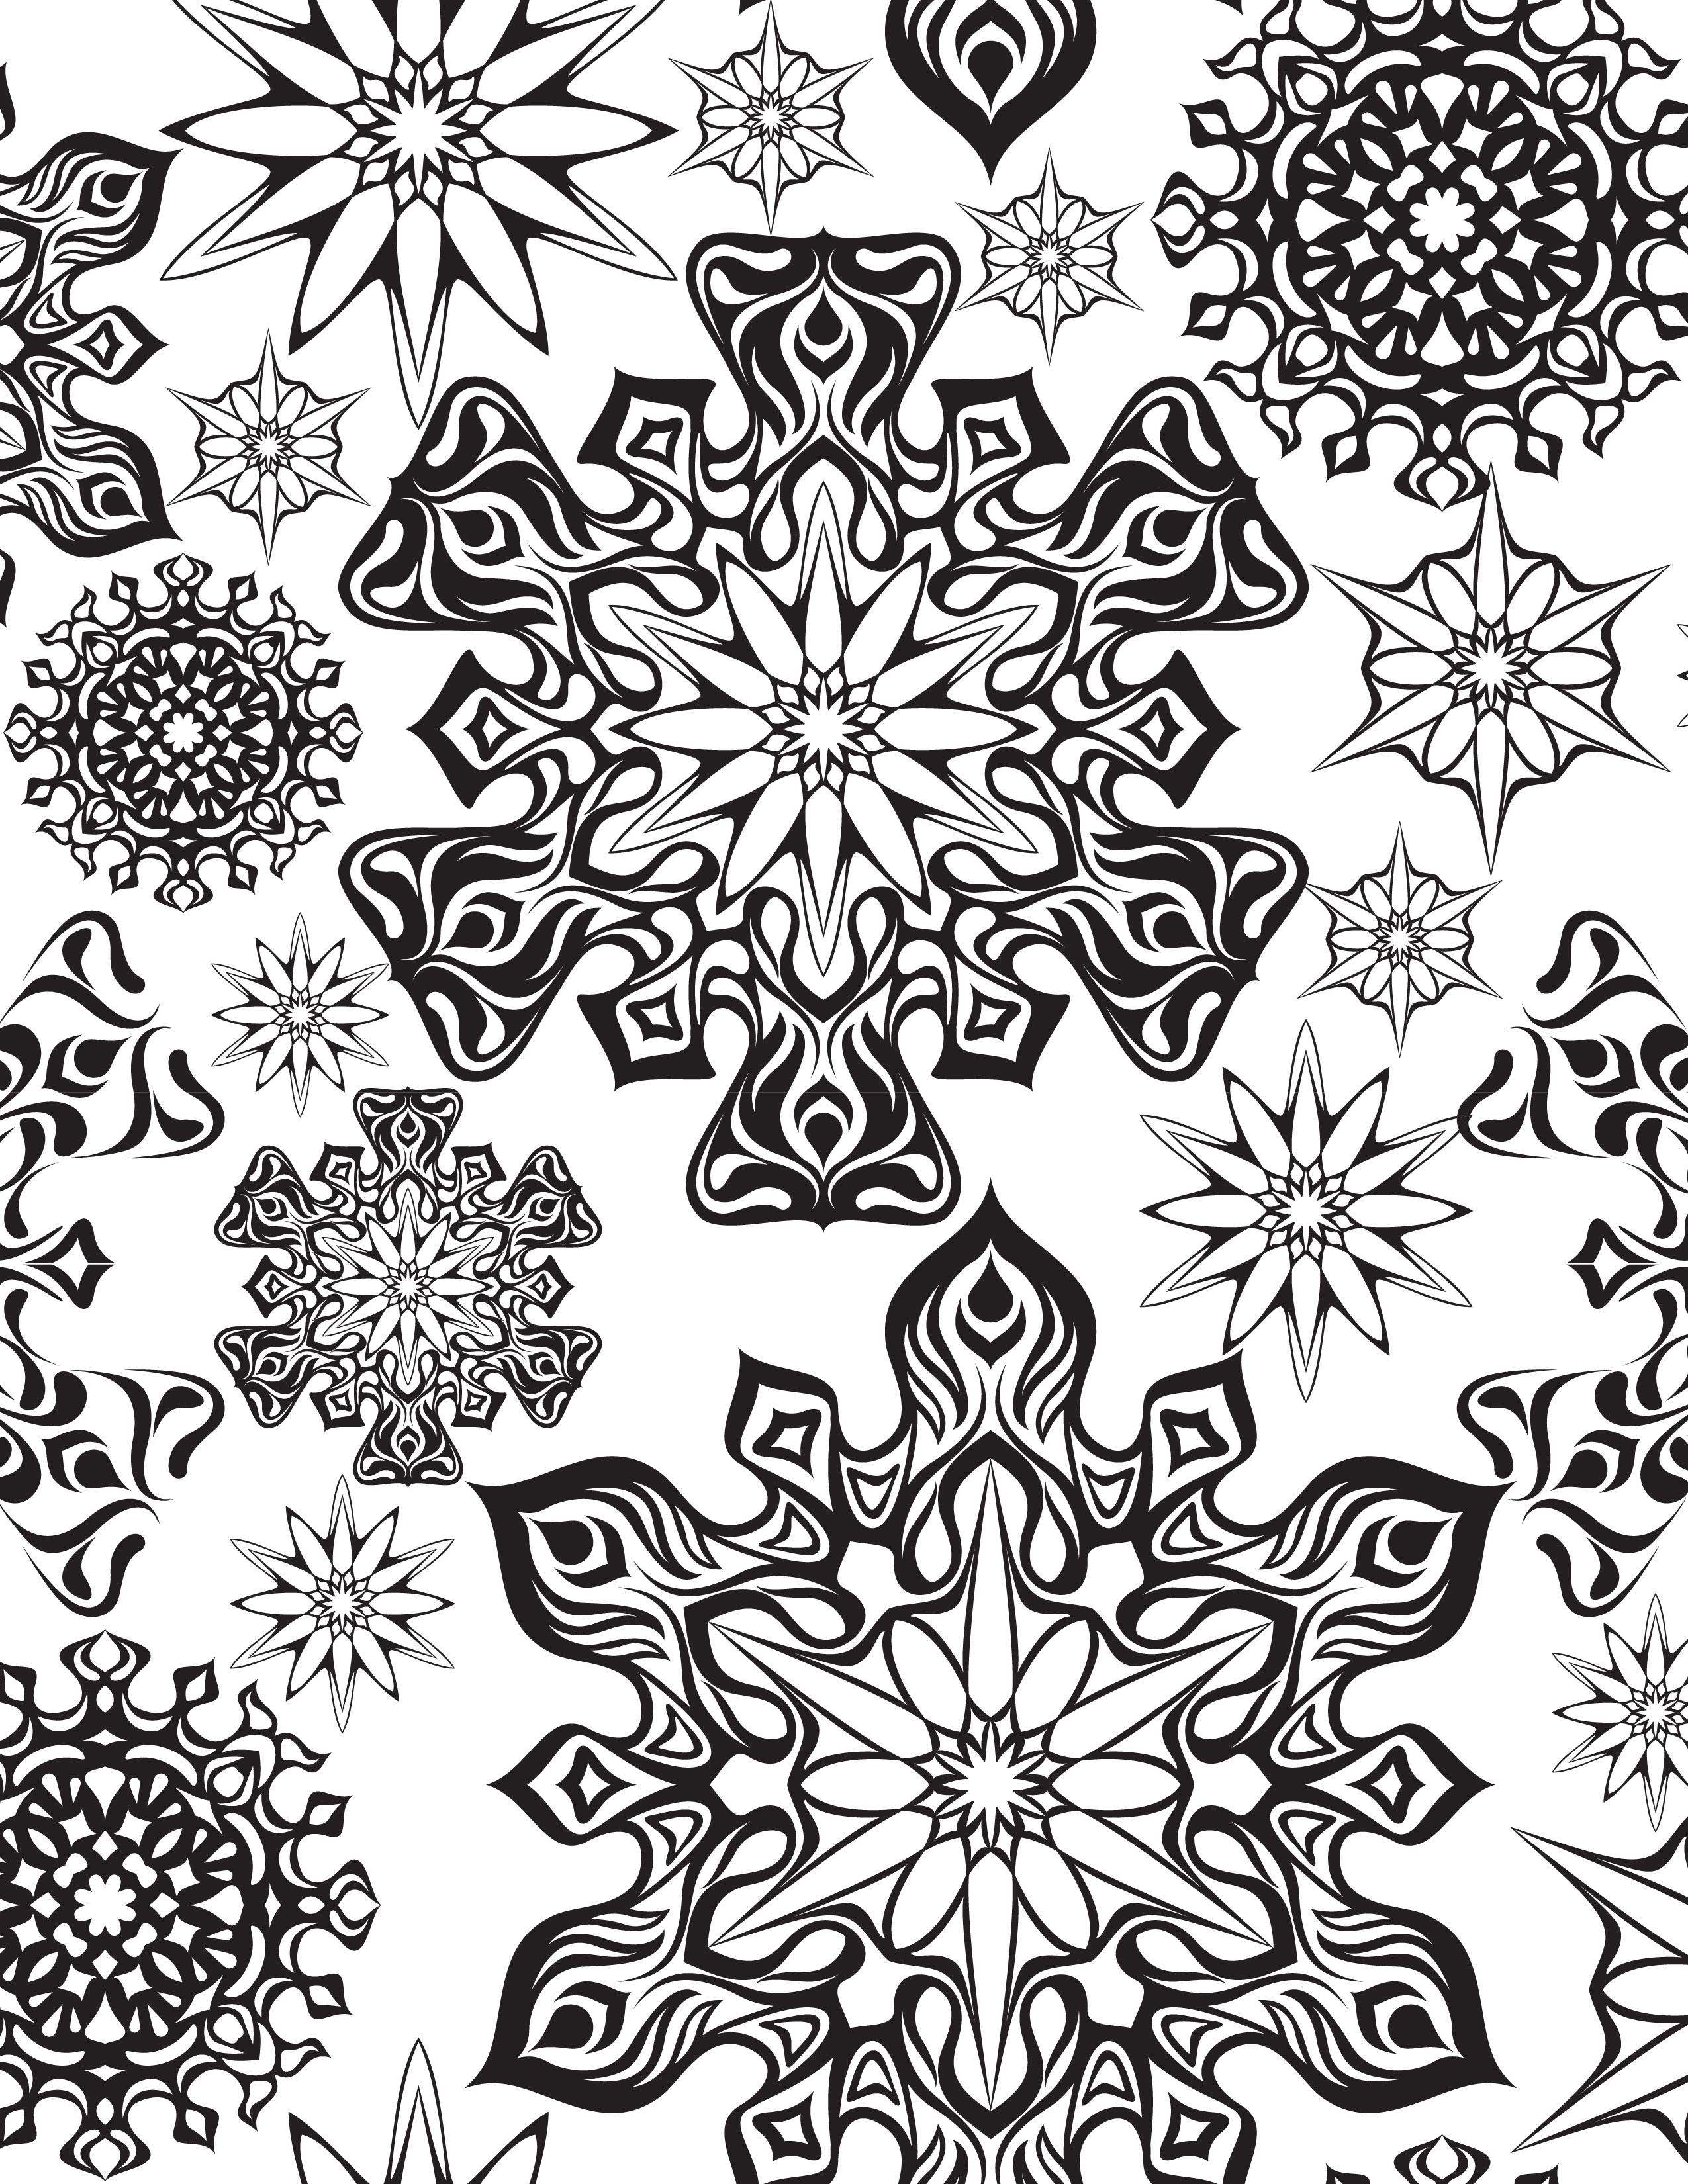 artherapie coloriage gratuit freepik flocons